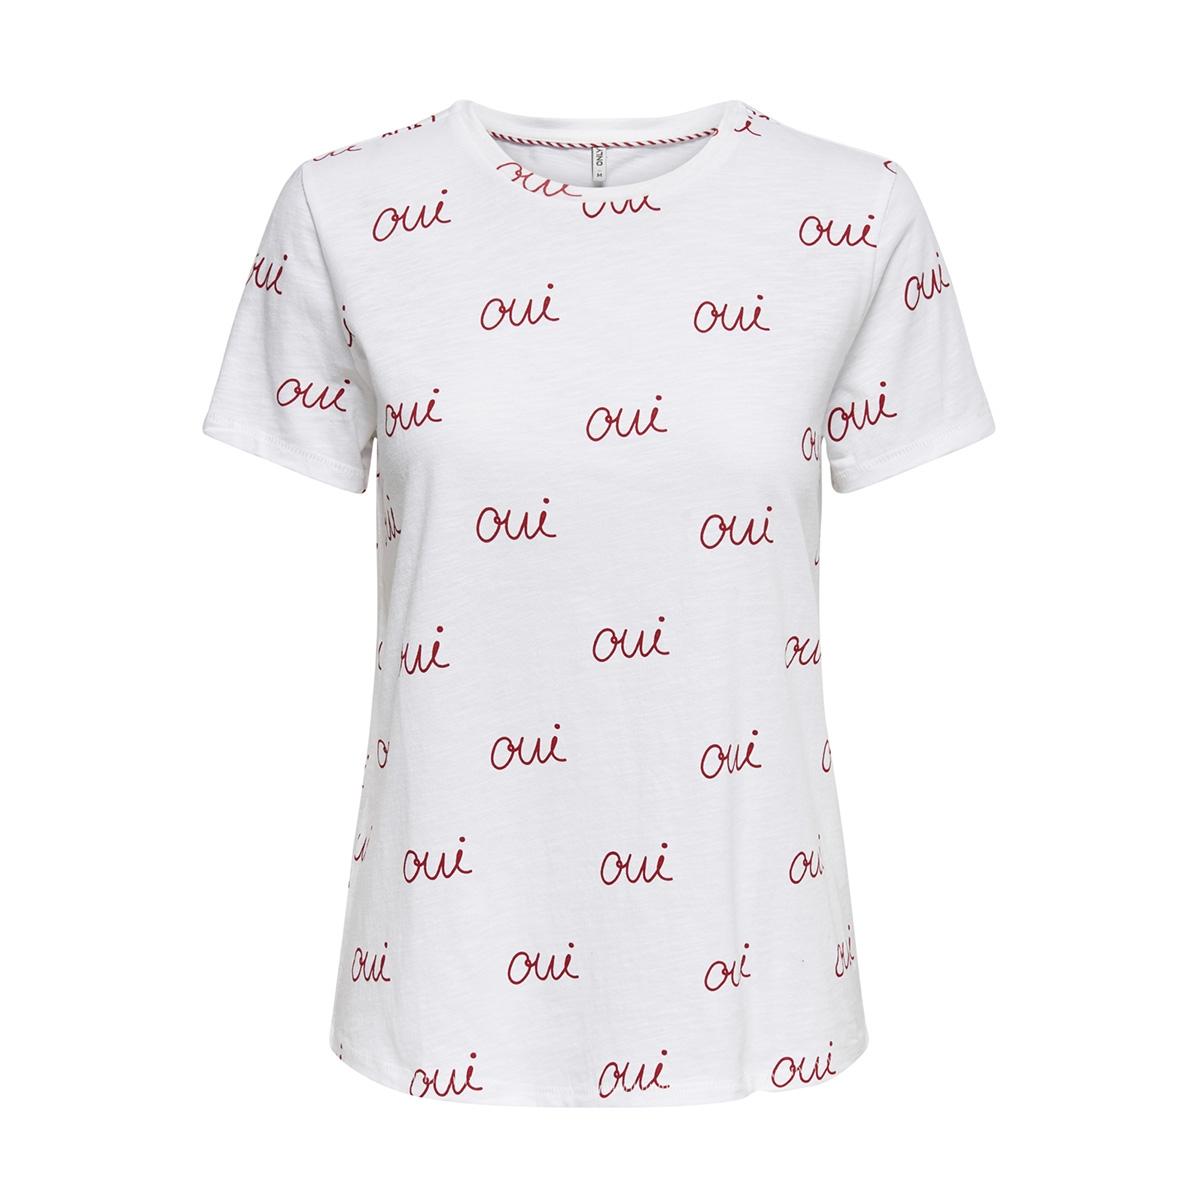 onlbone reg s/s love box co/sl jrs 15173709 only t-shirt bright white/qui(mars